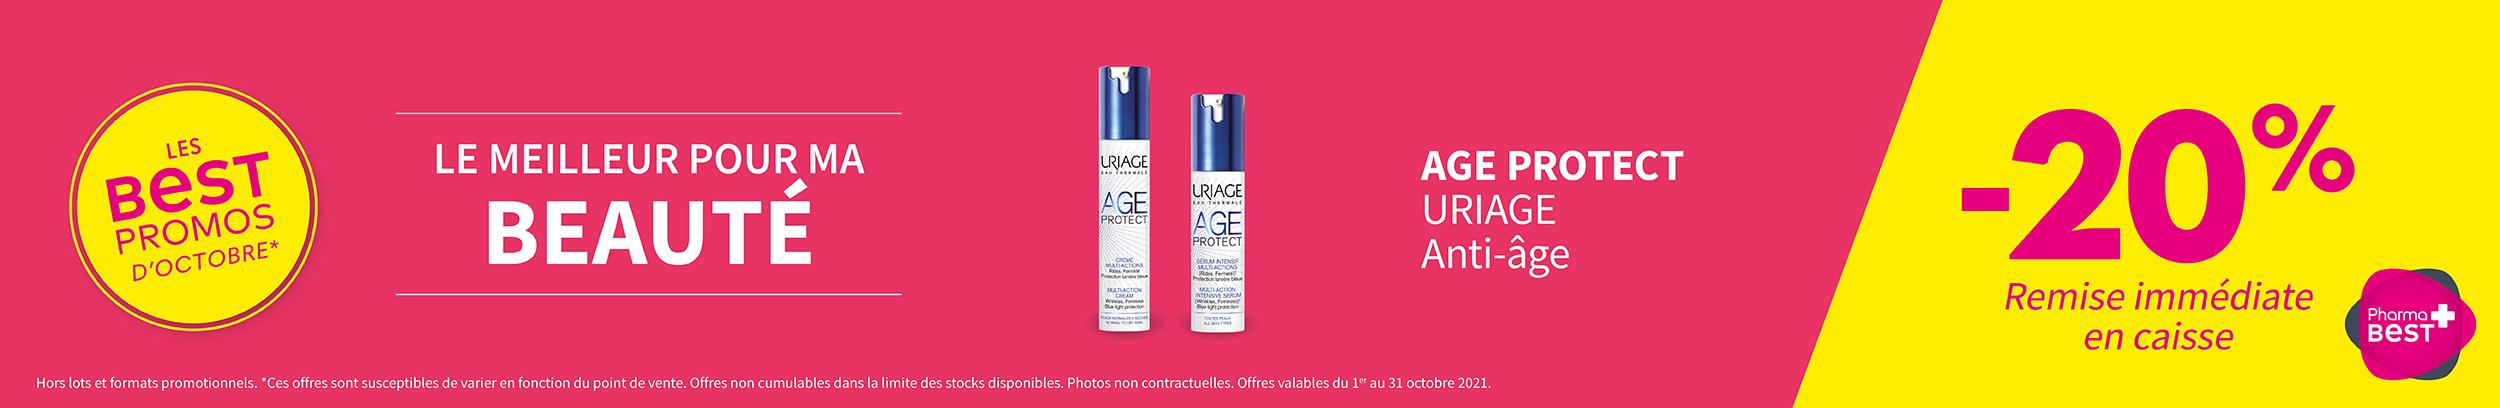 AGE PROTECT - URIAGE / Anti-âge